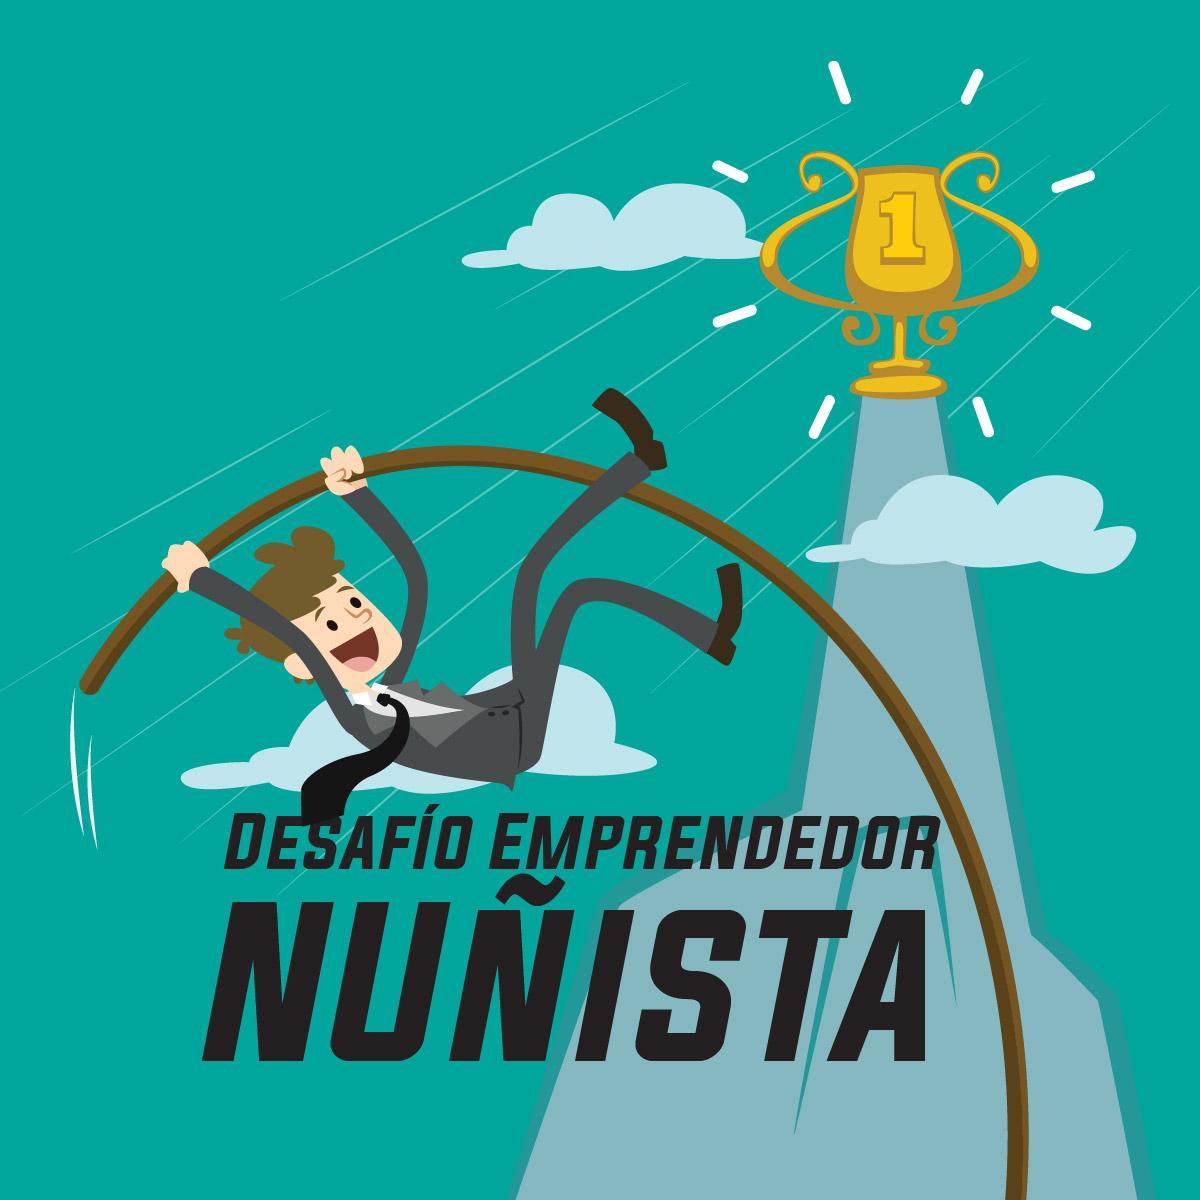 Abierta convocatoria Desafío Emprendedor Nuñista